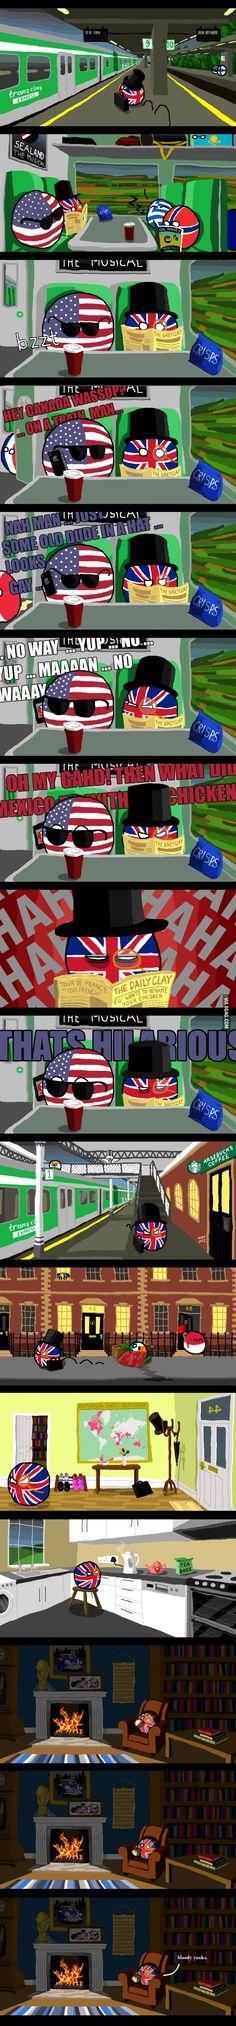 British Politeness